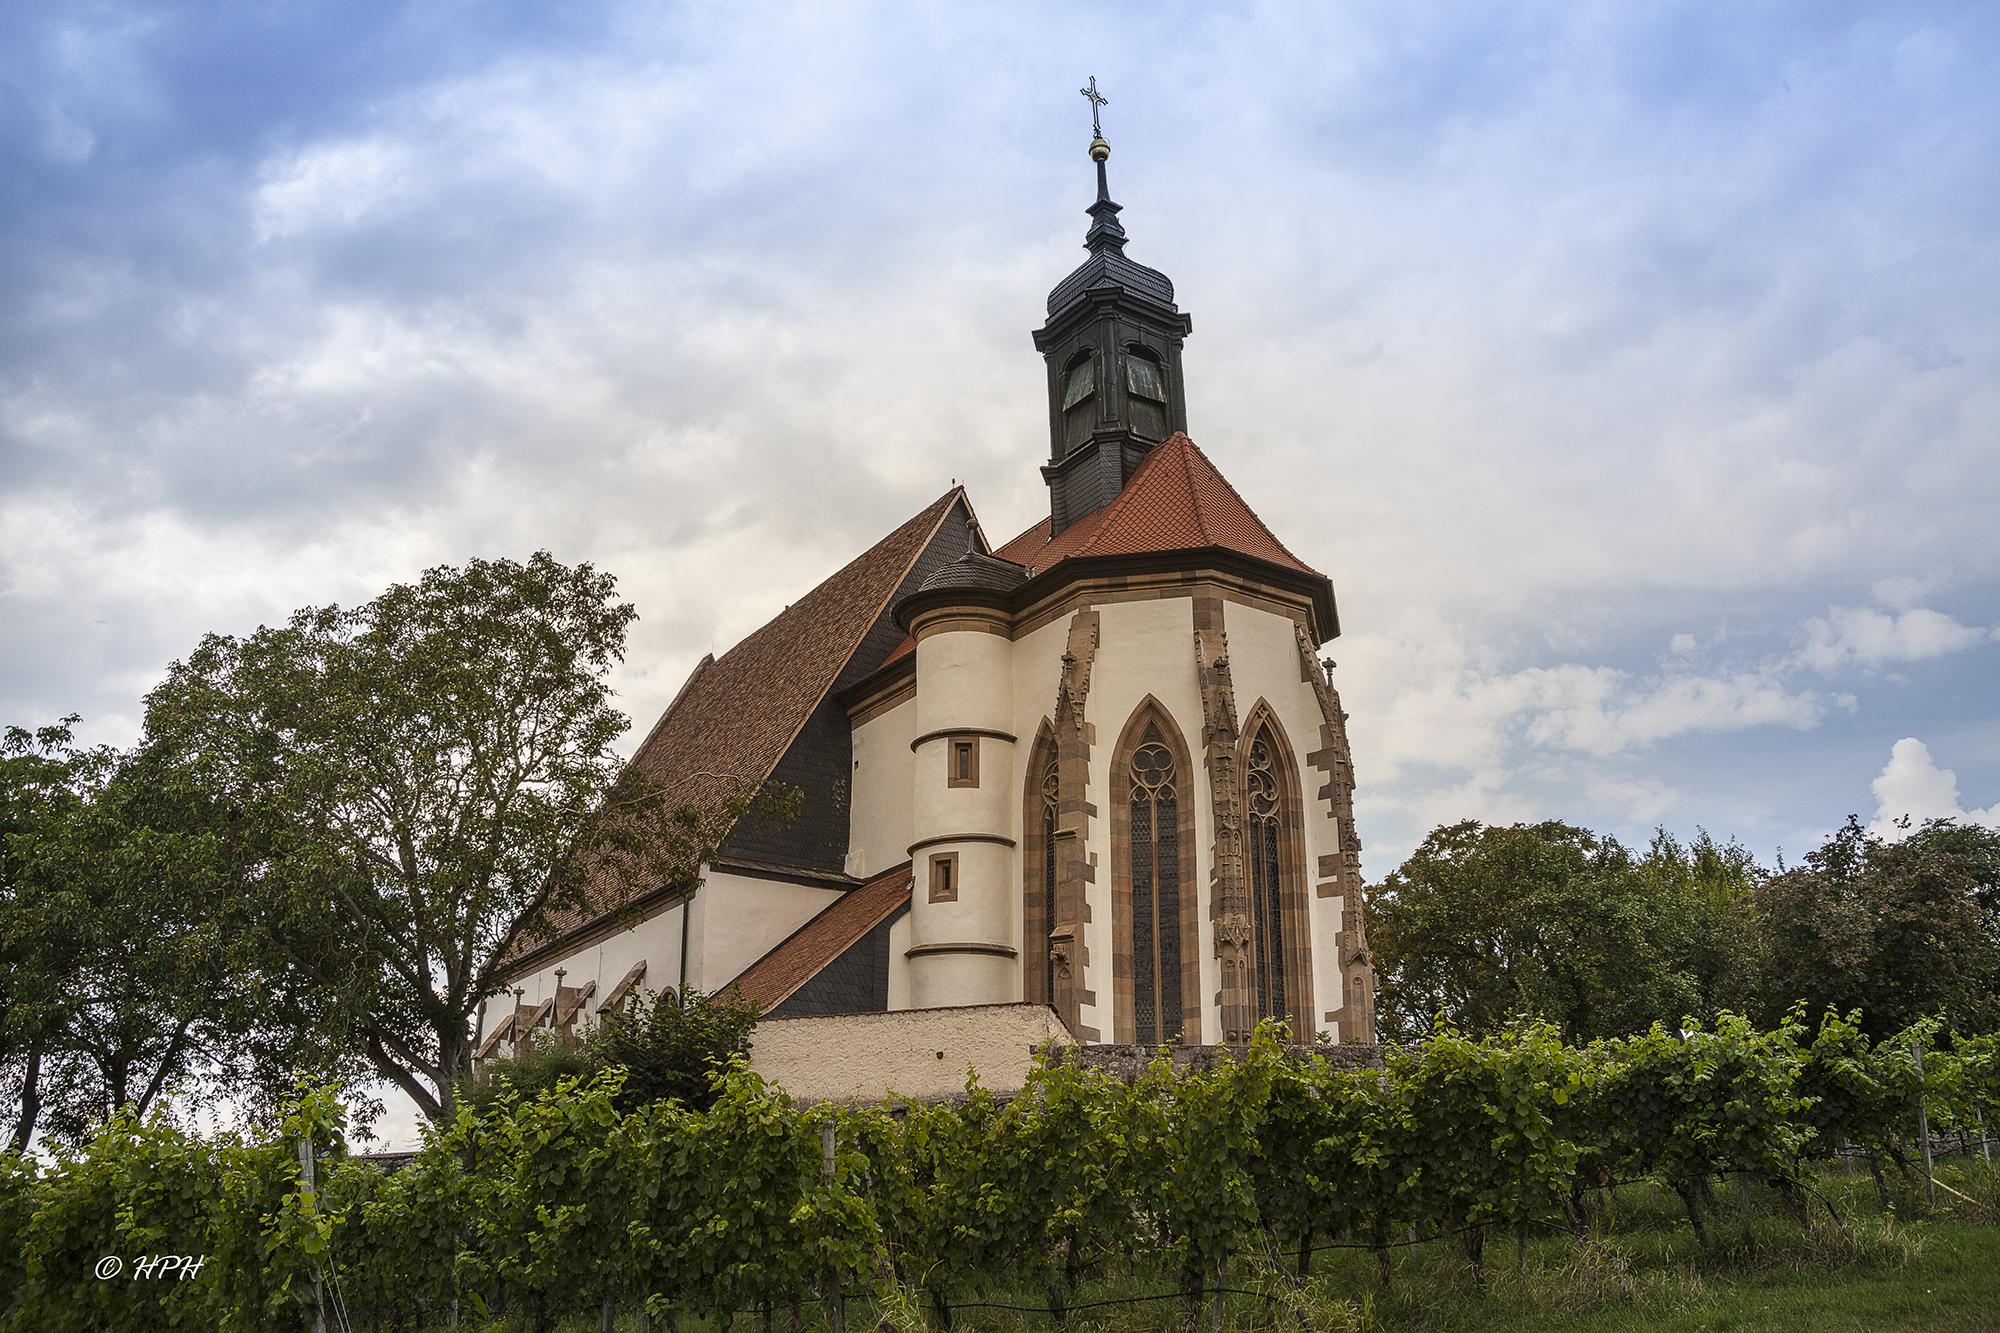 Pilgrimage church Maria im Weingarten, Germany